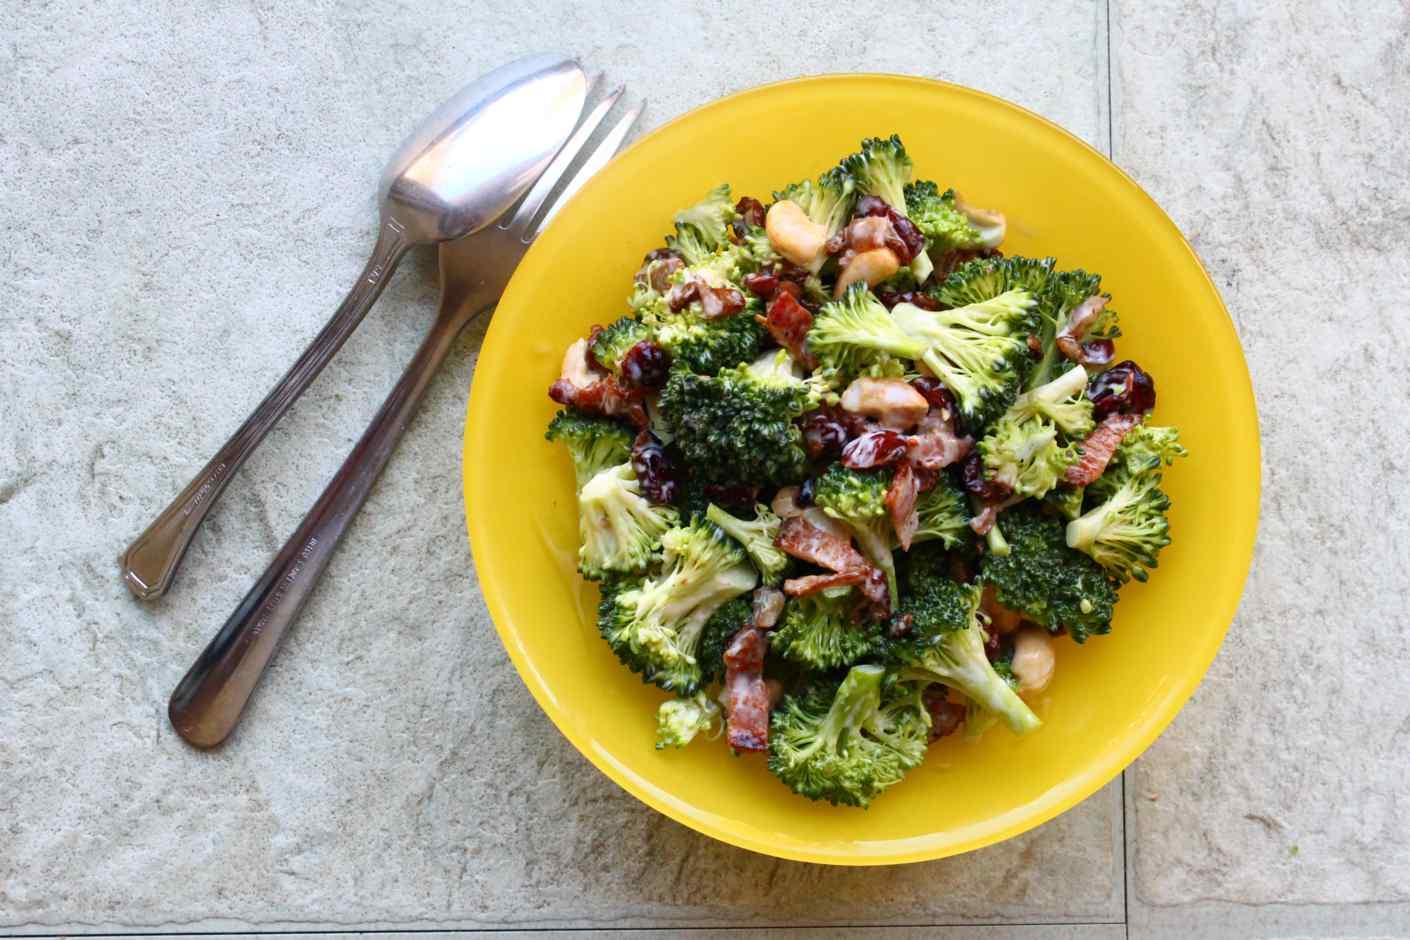 Broccoli Bacon Salad With Creamy Dressing Recipe